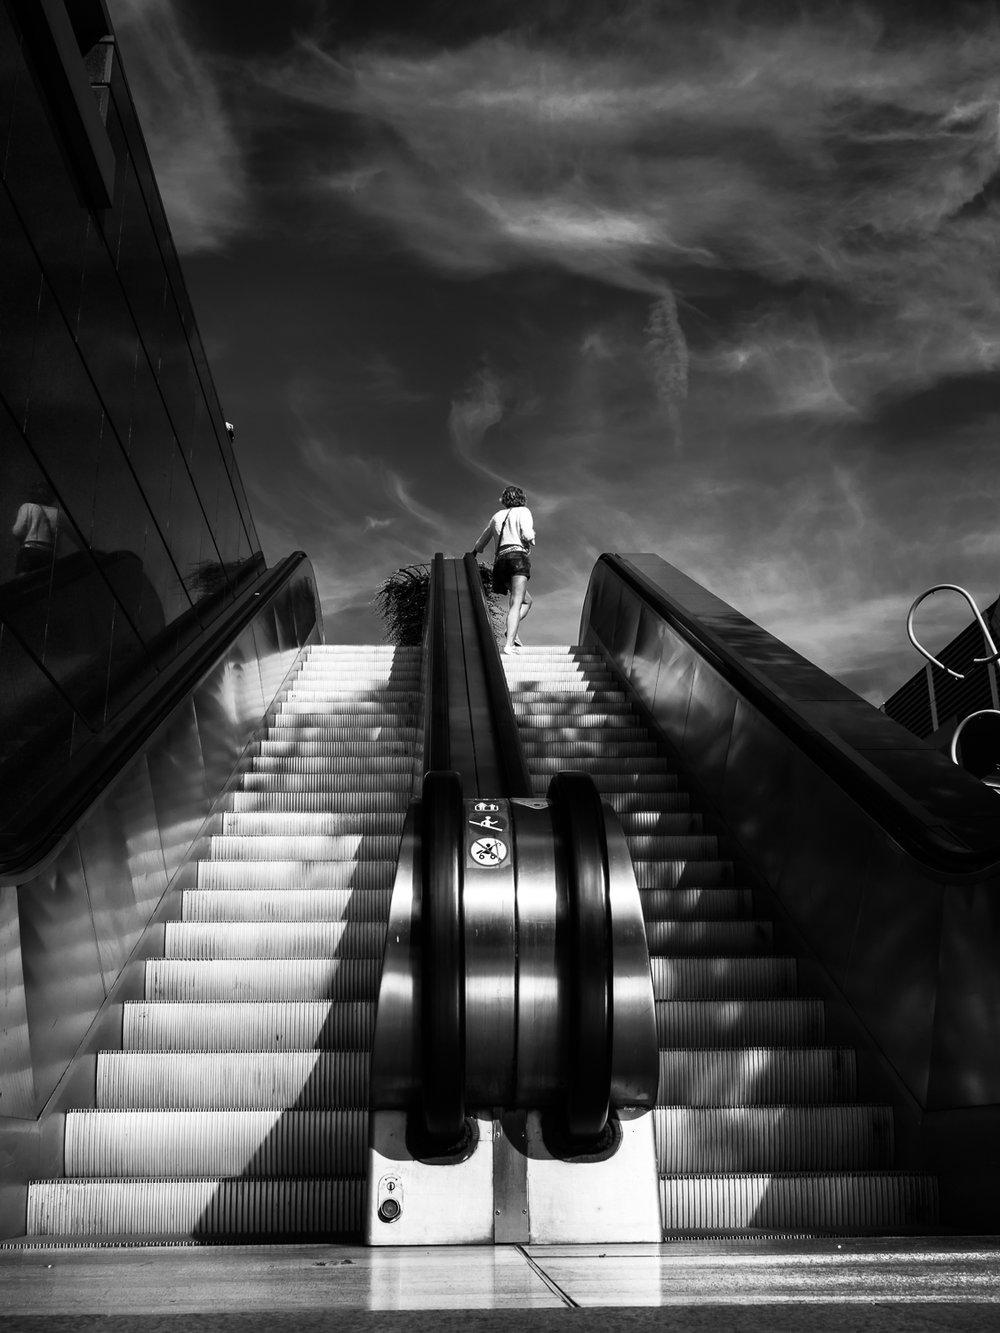 fokko muller street photography - 160910 - 008.jpg